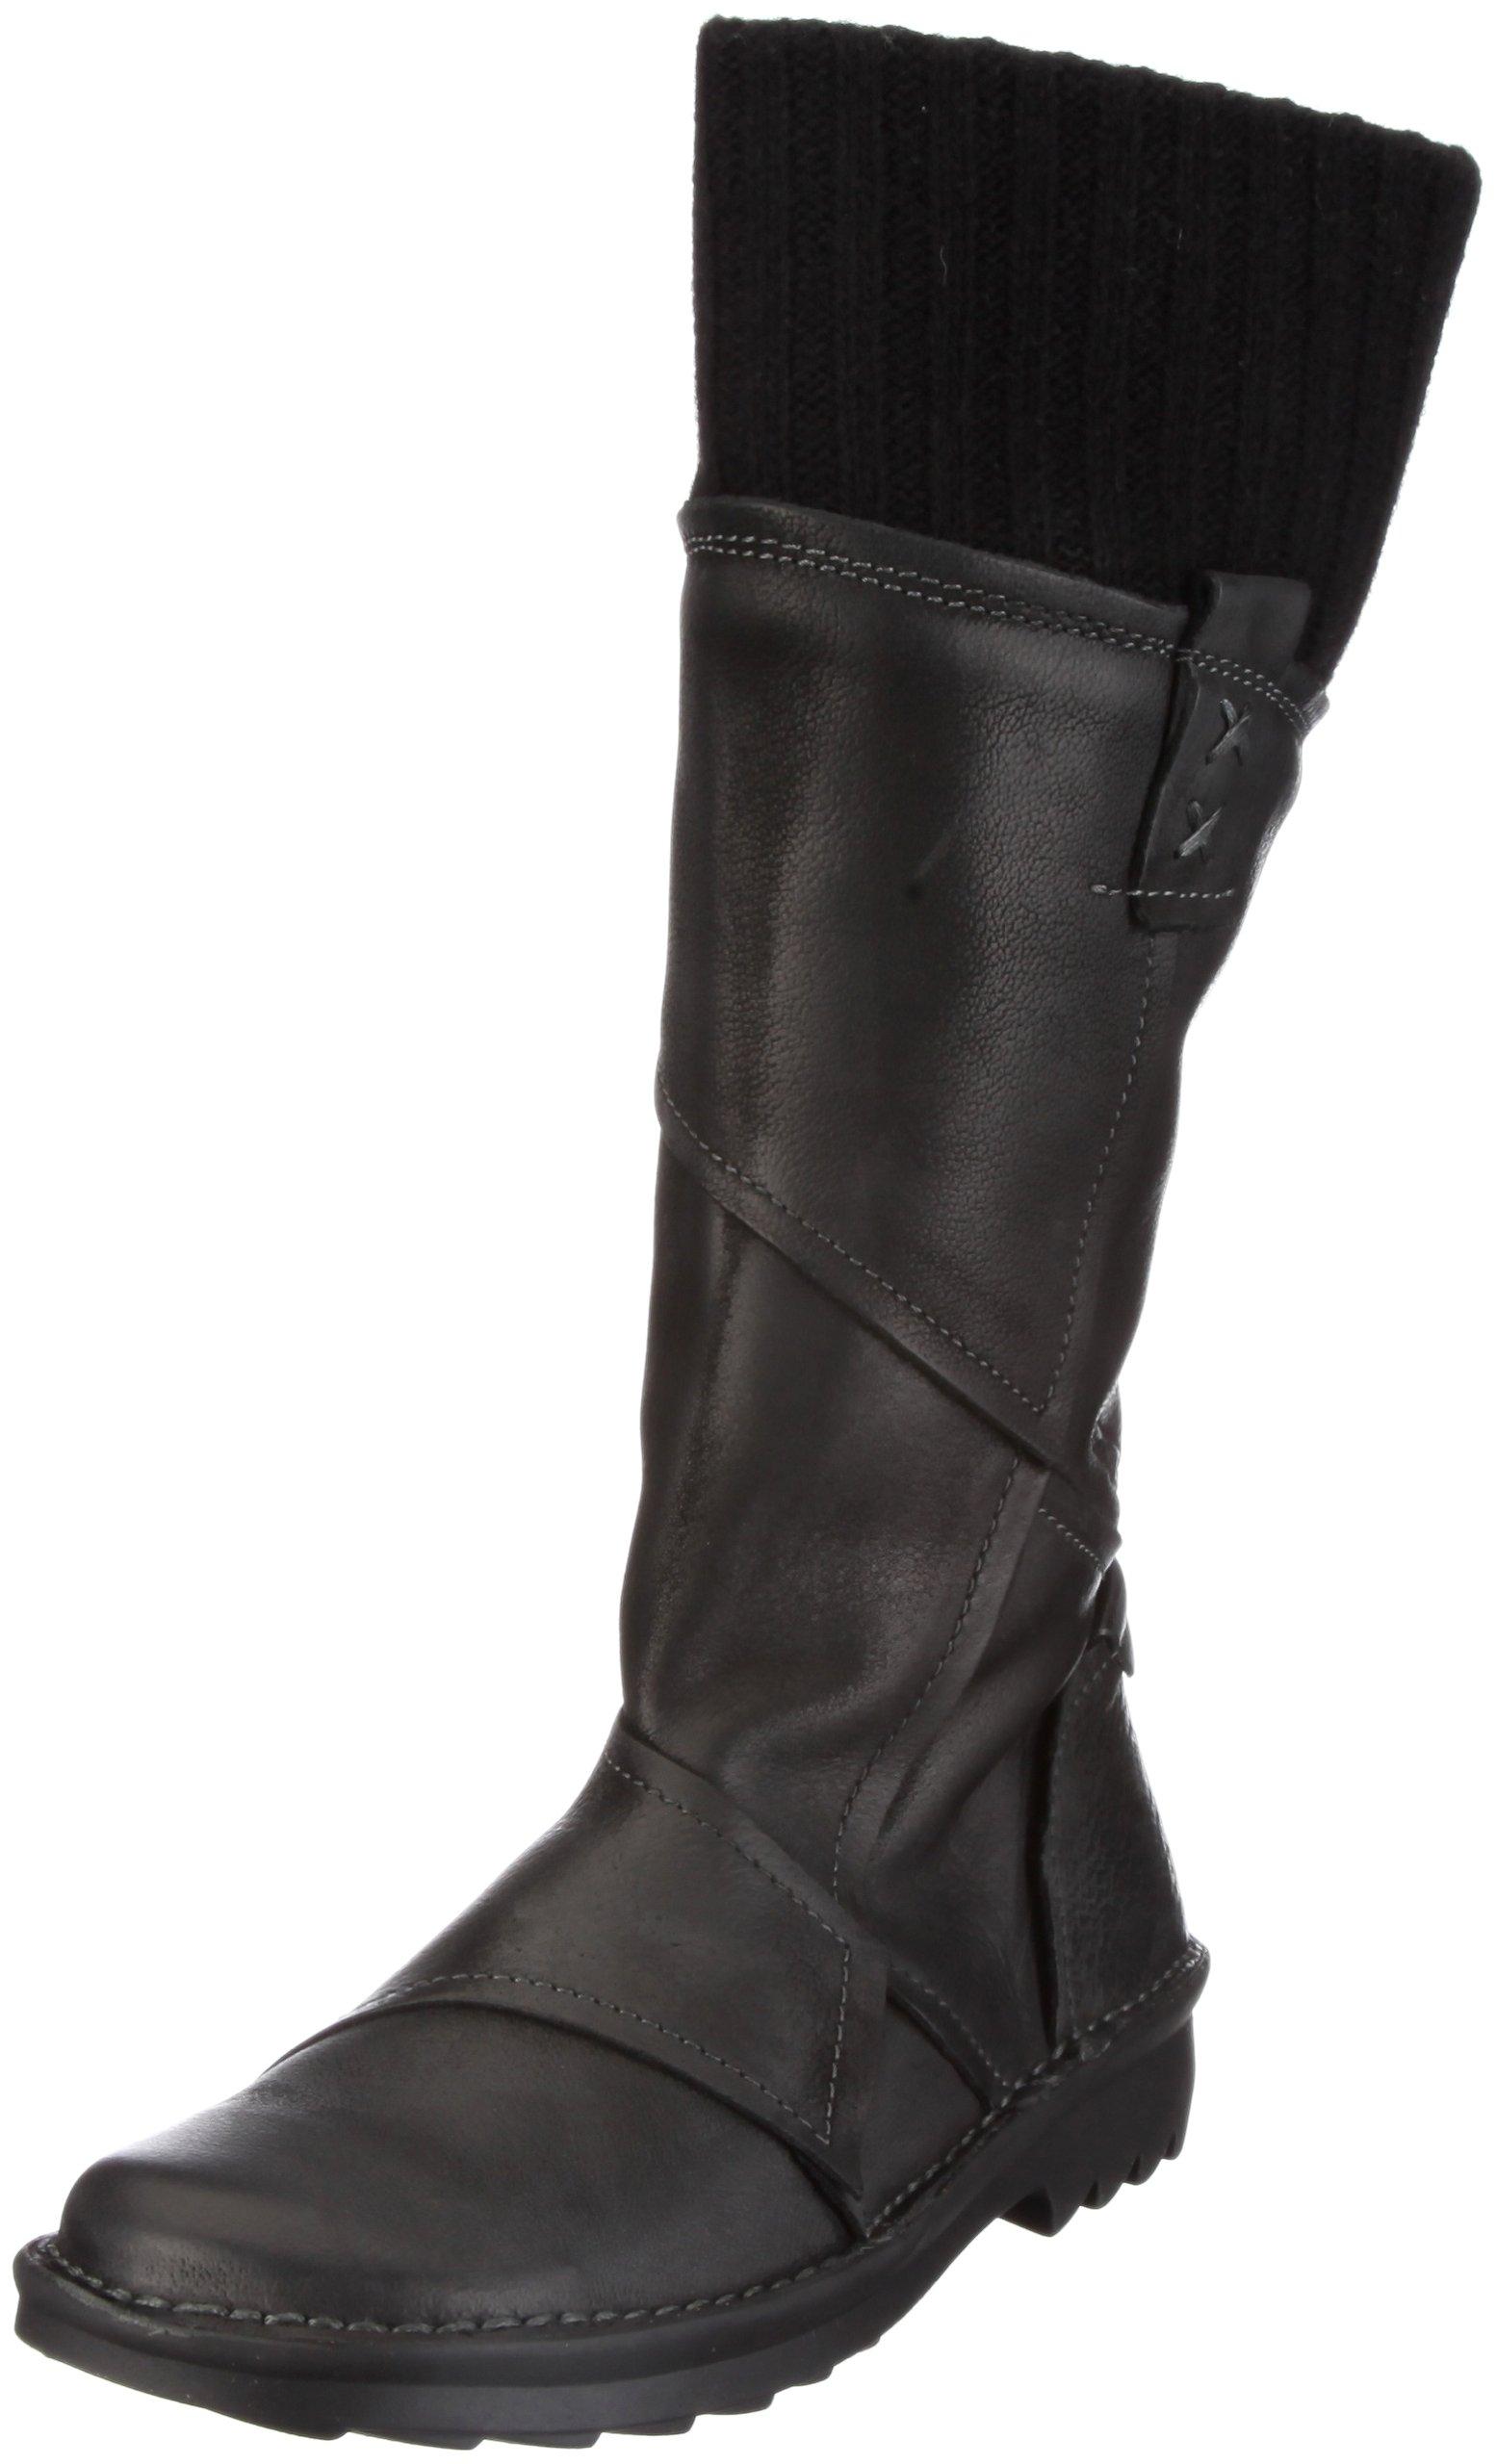 camel active pandora women 39 s boots black 7 uk new ebay. Black Bedroom Furniture Sets. Home Design Ideas